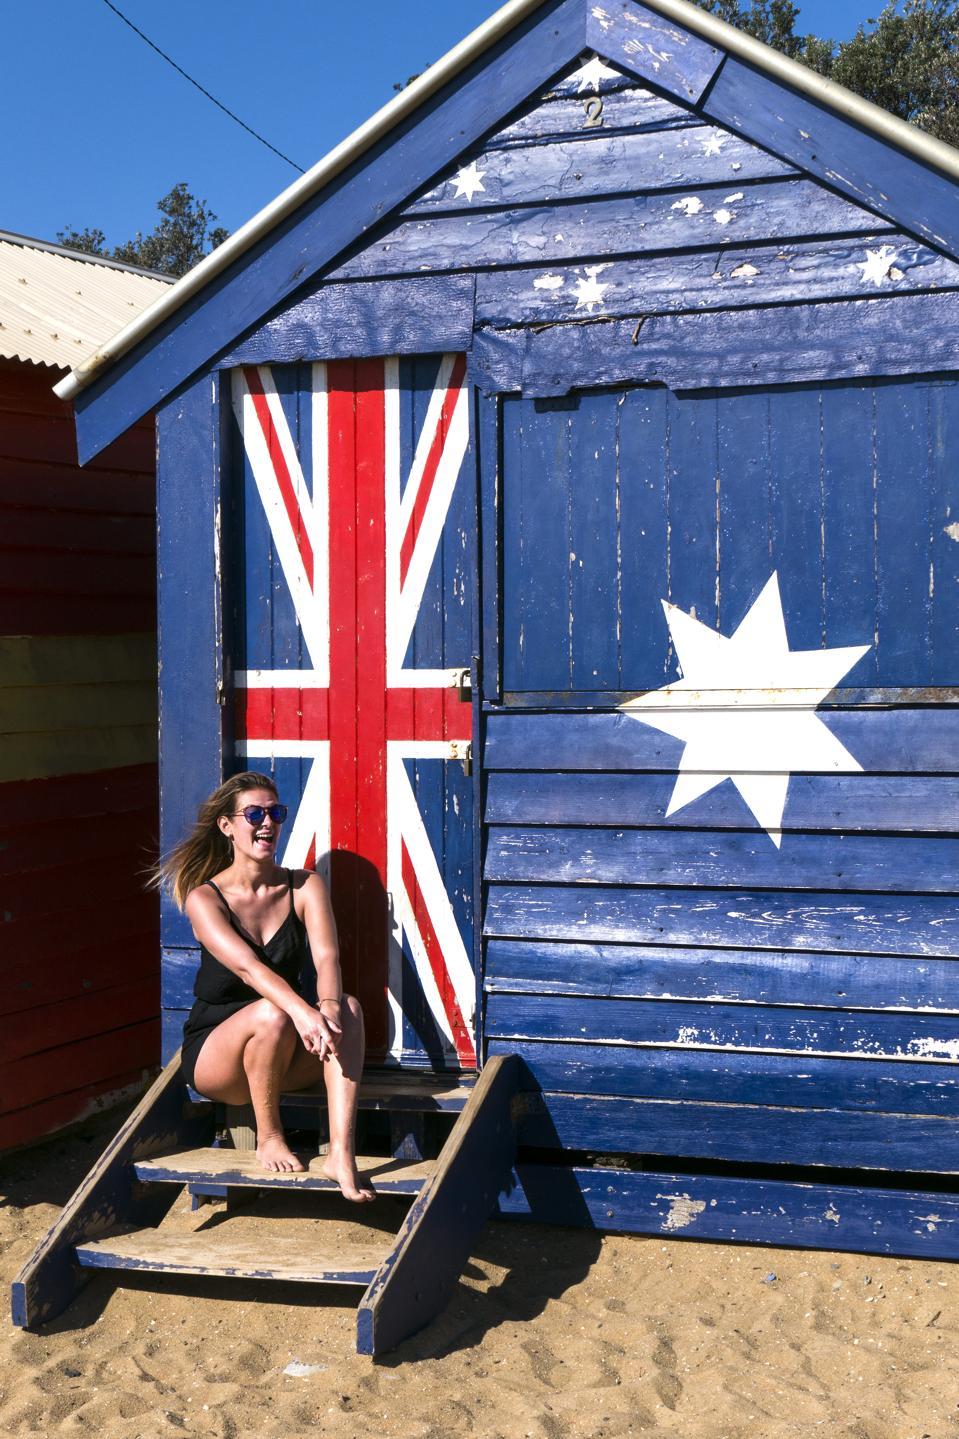 Young woman poses for photo bathing box Brighton Melbourne Australia